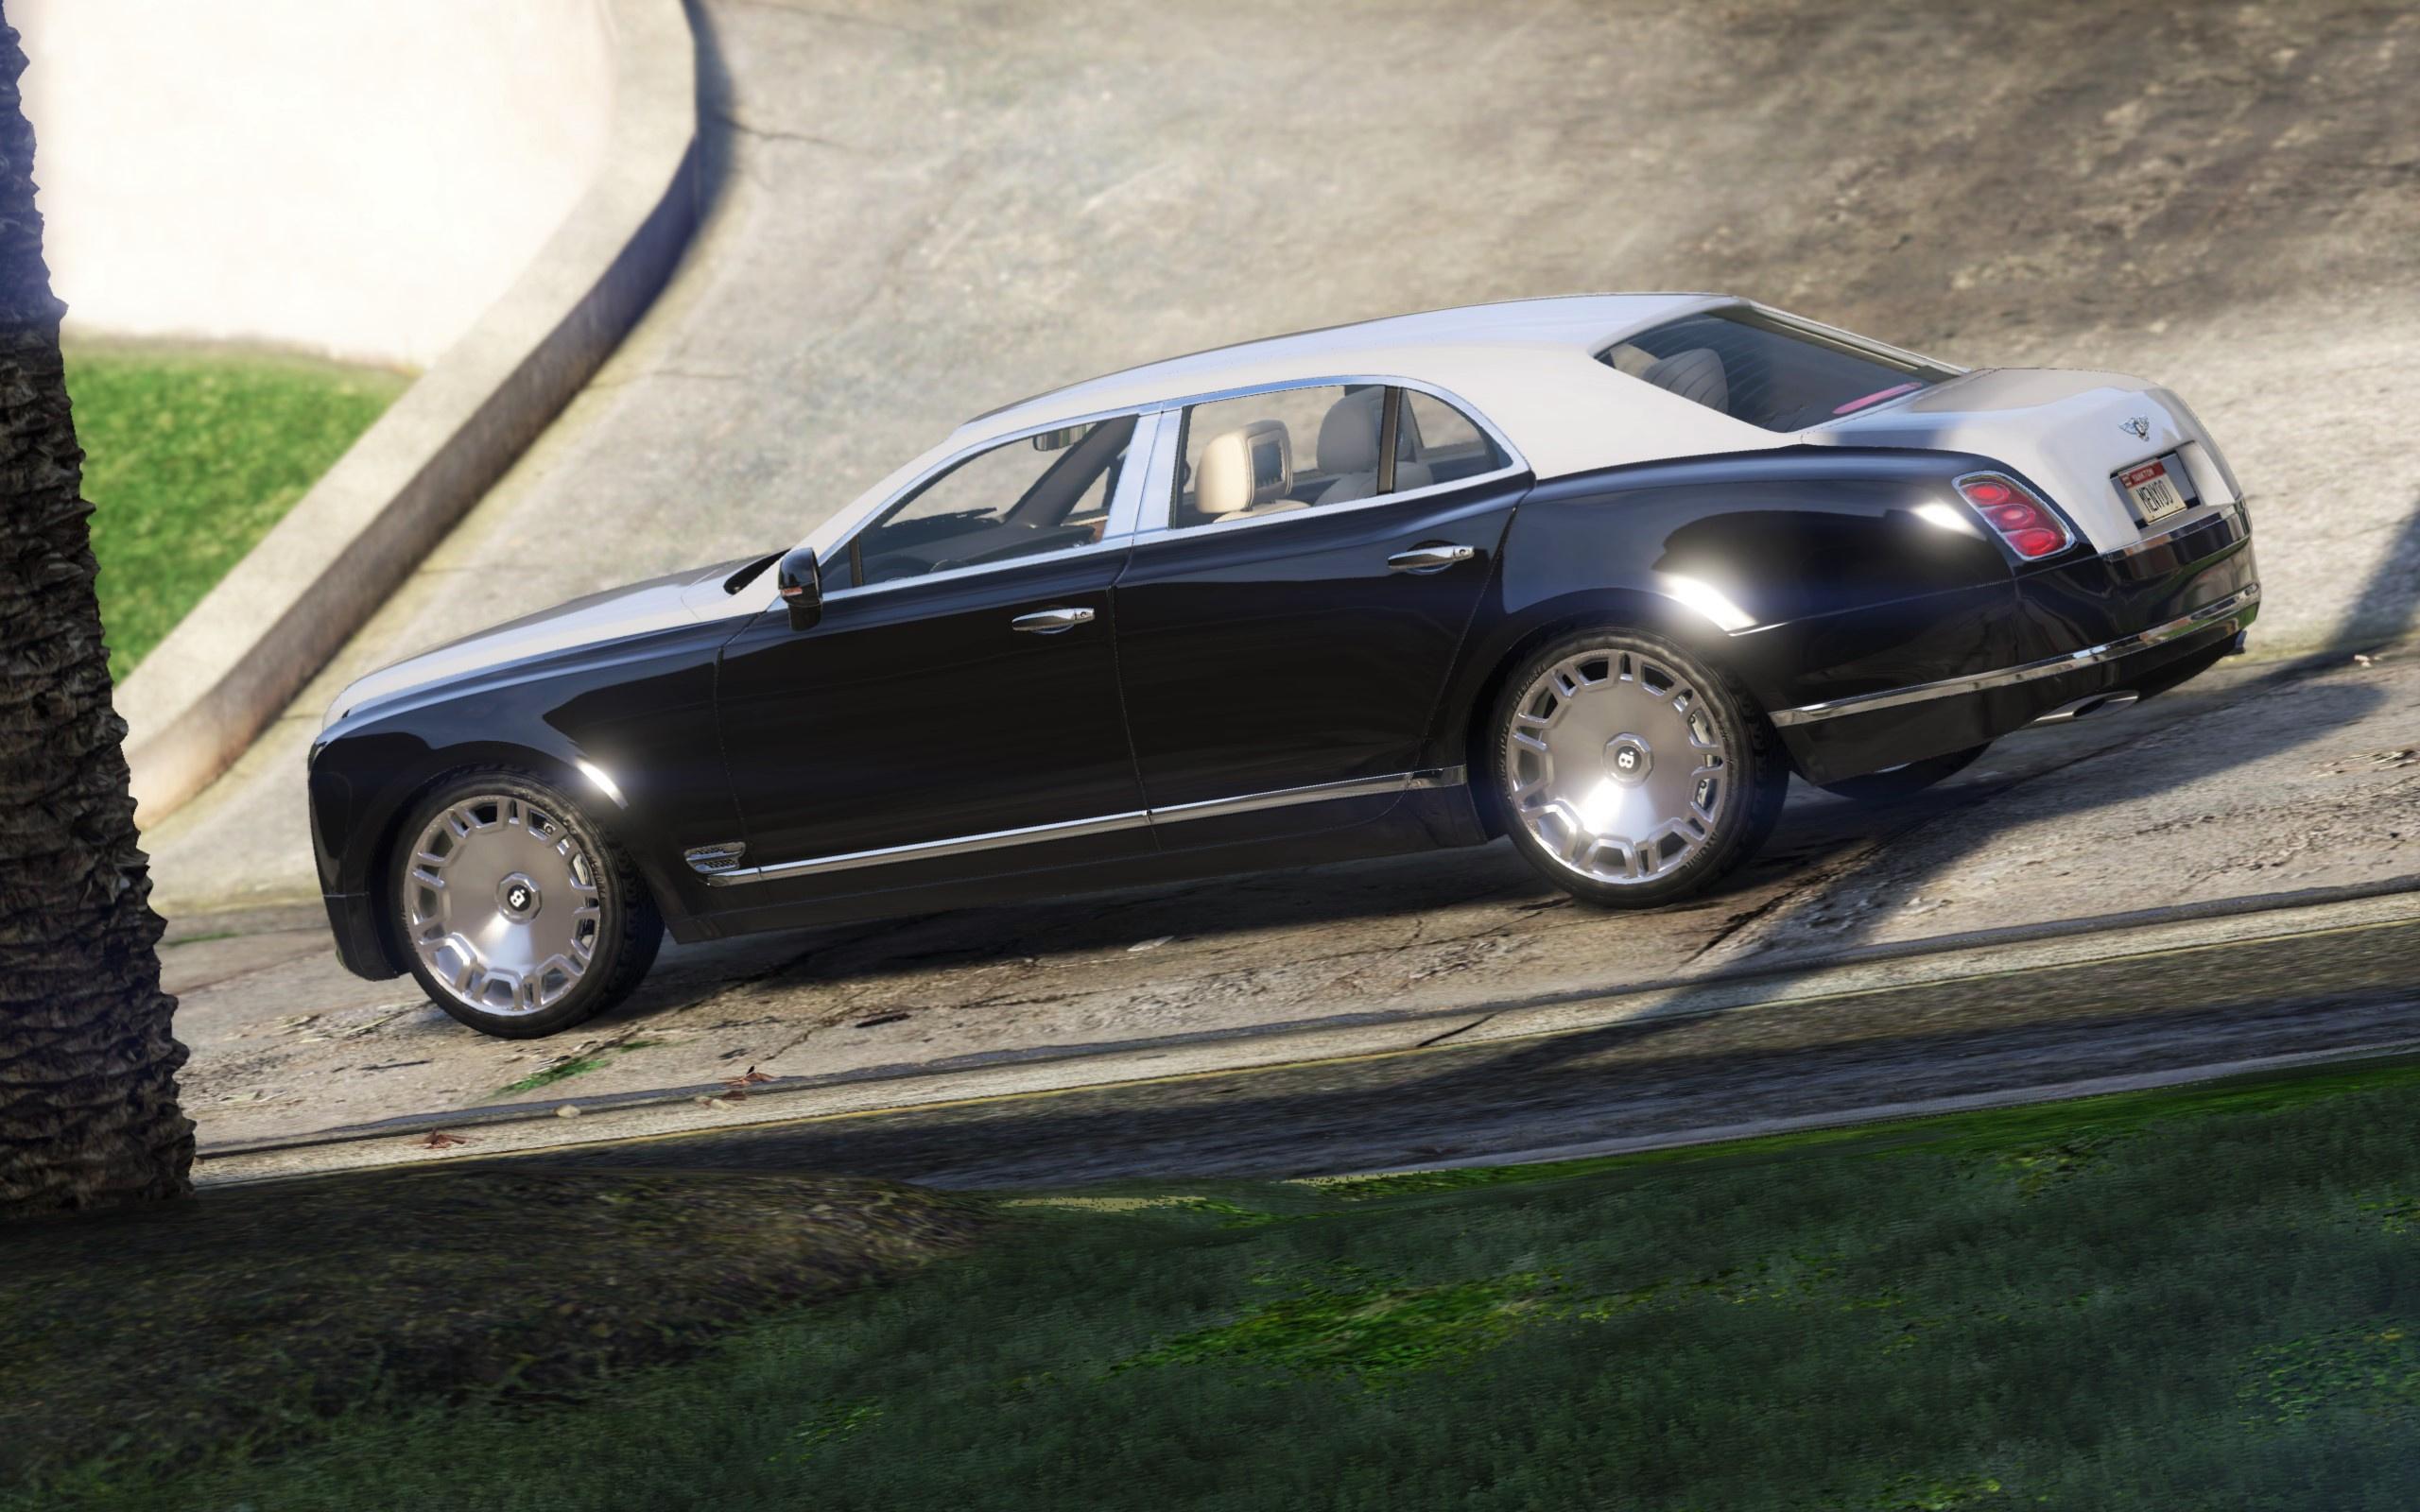 Bentley Mulsanne Mulliner 2013 [Add-On / Replace] - GTA5-Mods.com